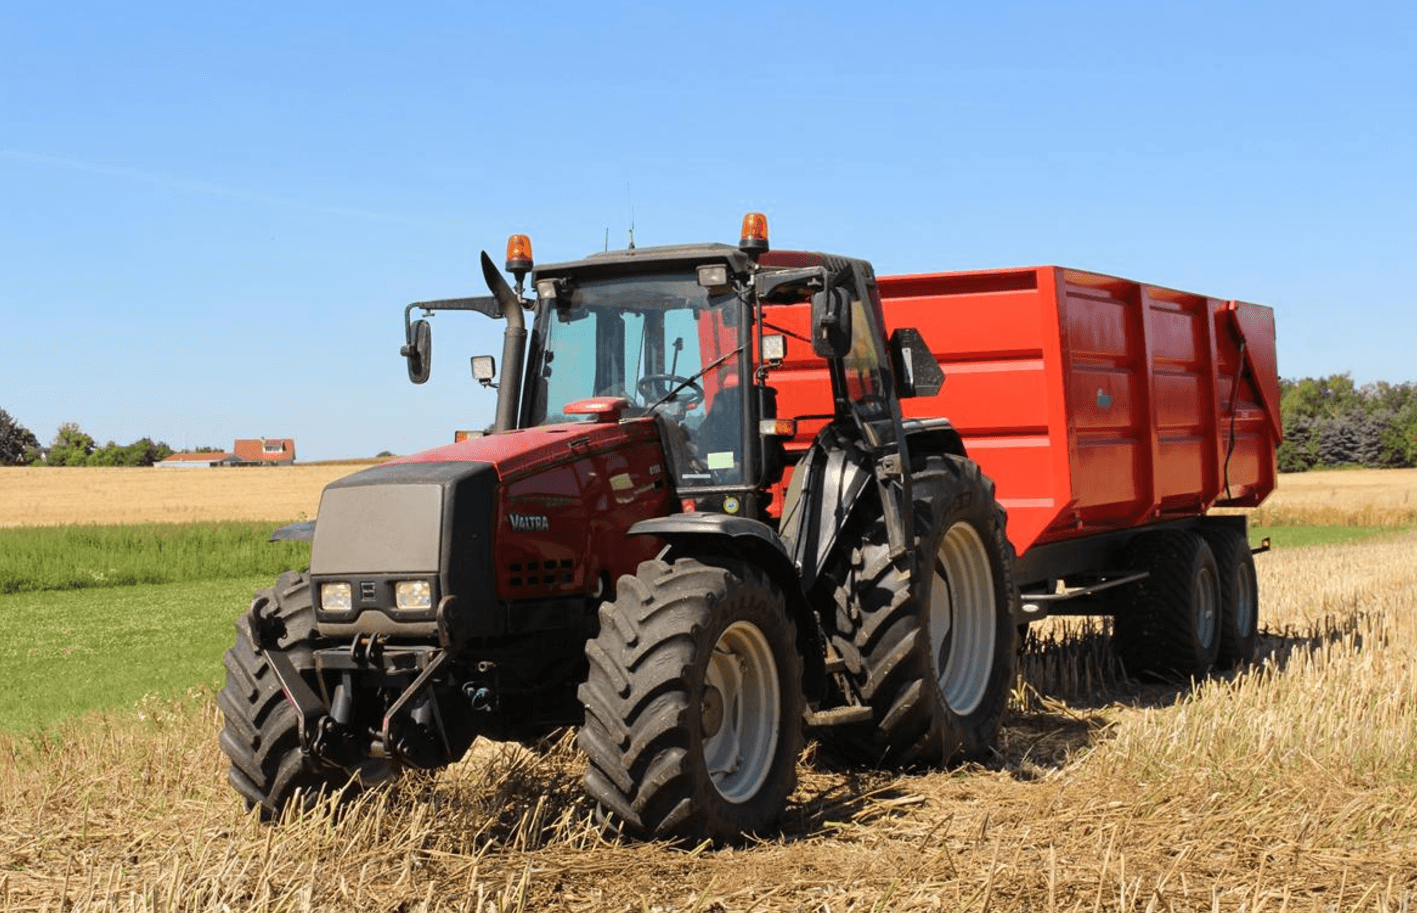 avis 8150 de la marque valtra tracteurs agricoles. Black Bedroom Furniture Sets. Home Design Ideas